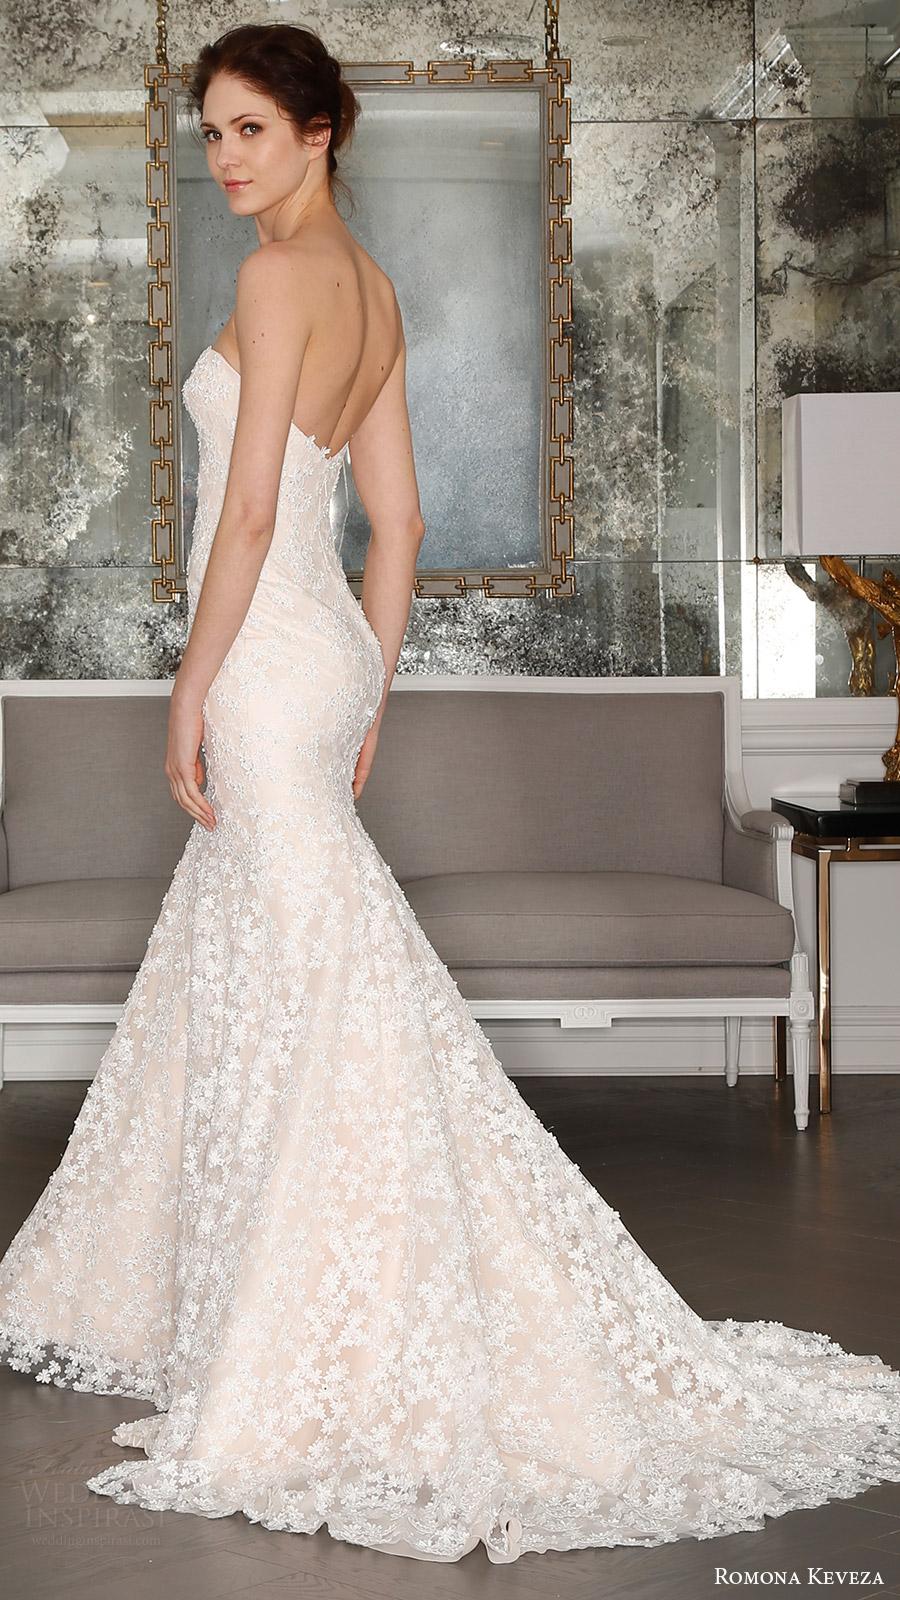 romona keveza bridal spring 2017 strapless sweetheart trumpet wedding dress (rk7408) bv train